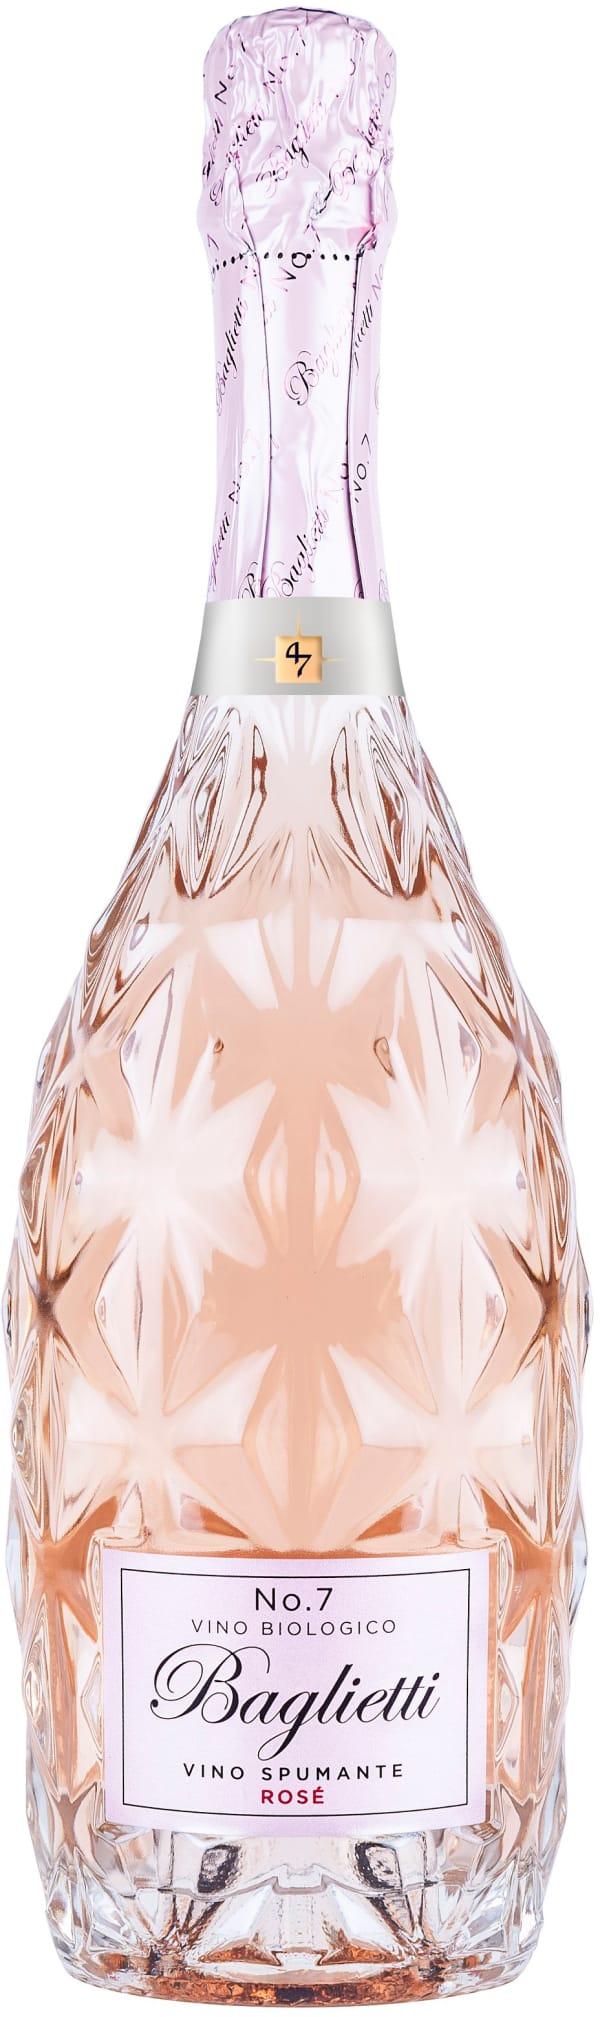 Baglietti Rosé No.7 Extra Dry